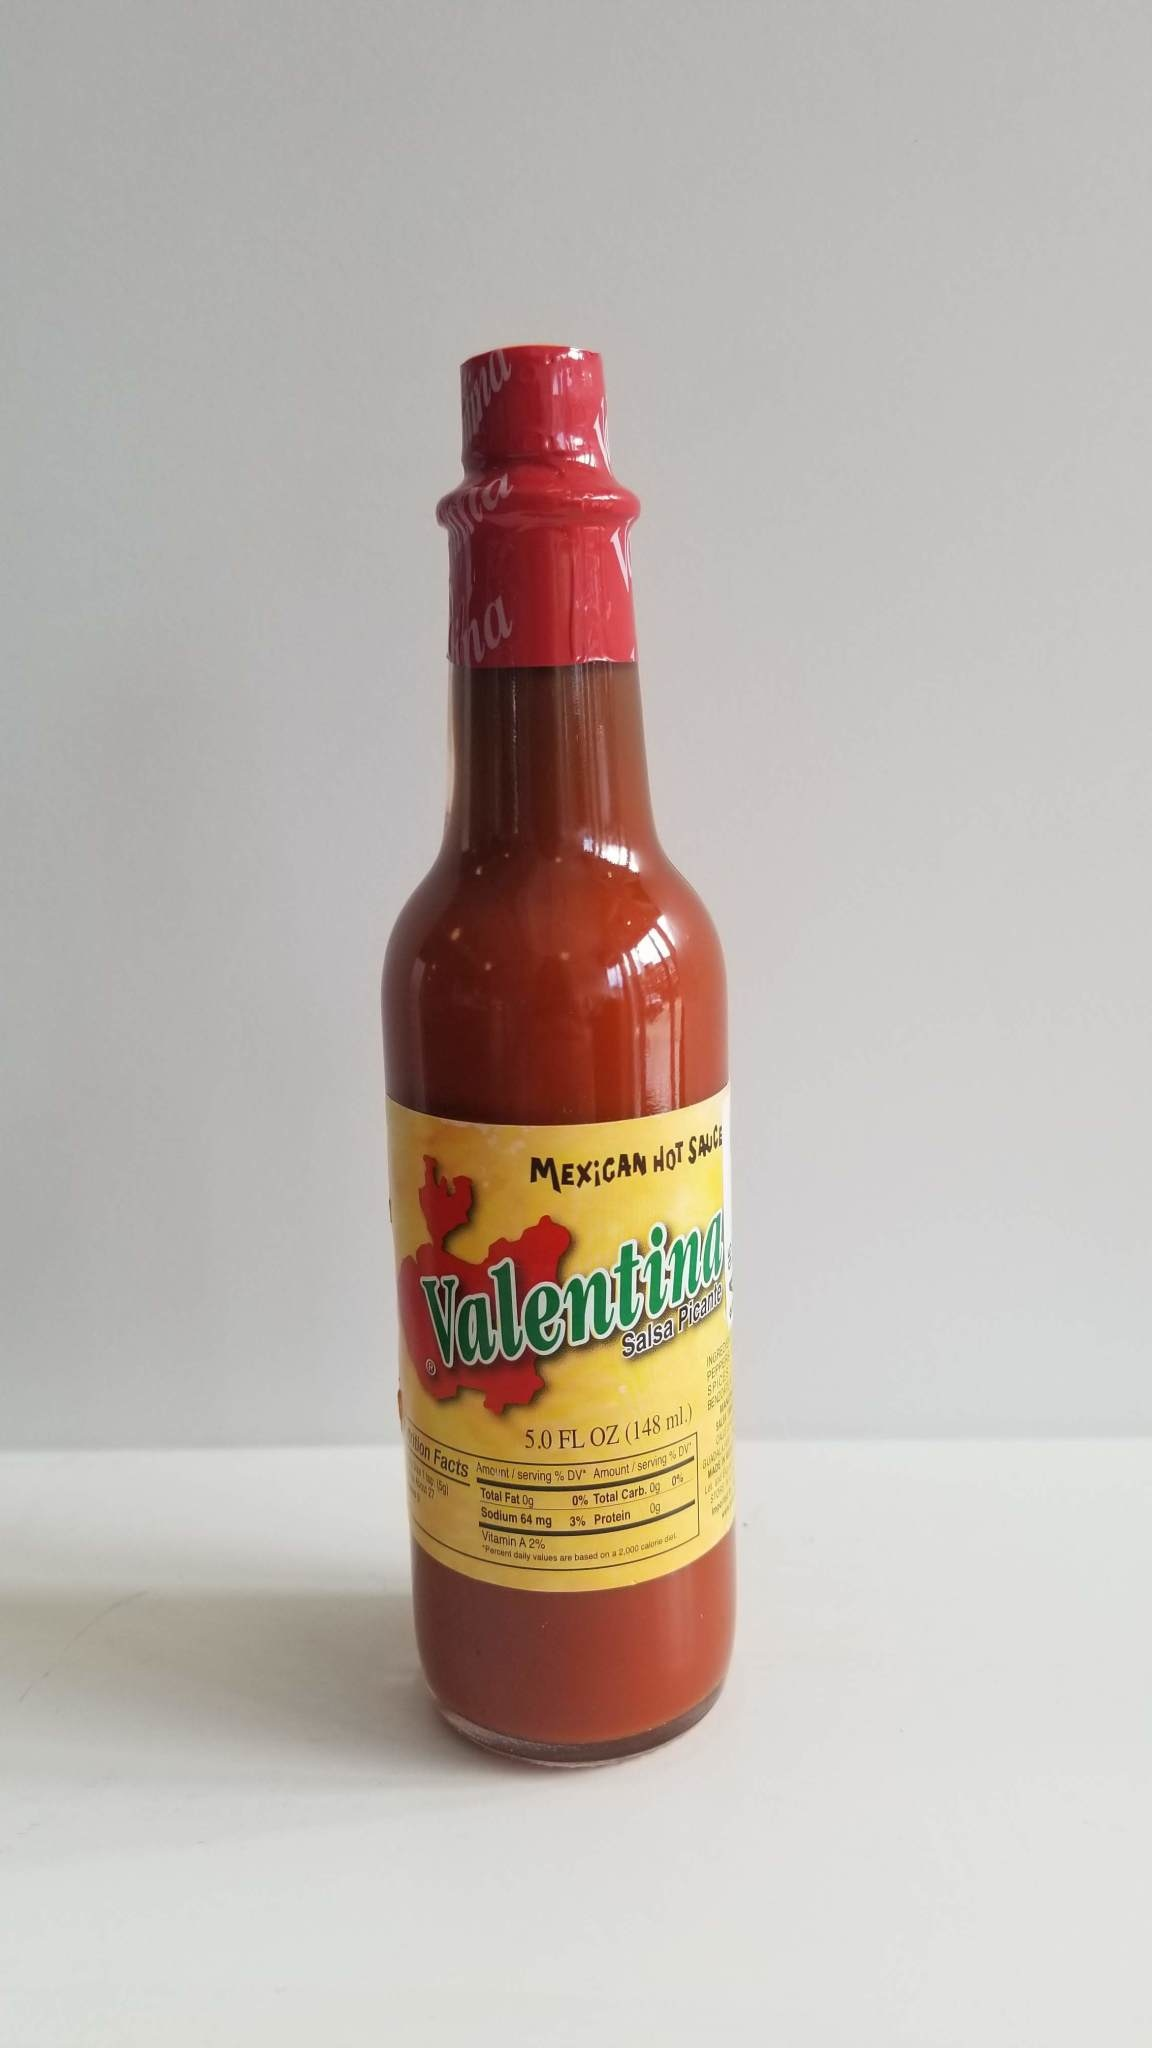 Valentina (148 ml)